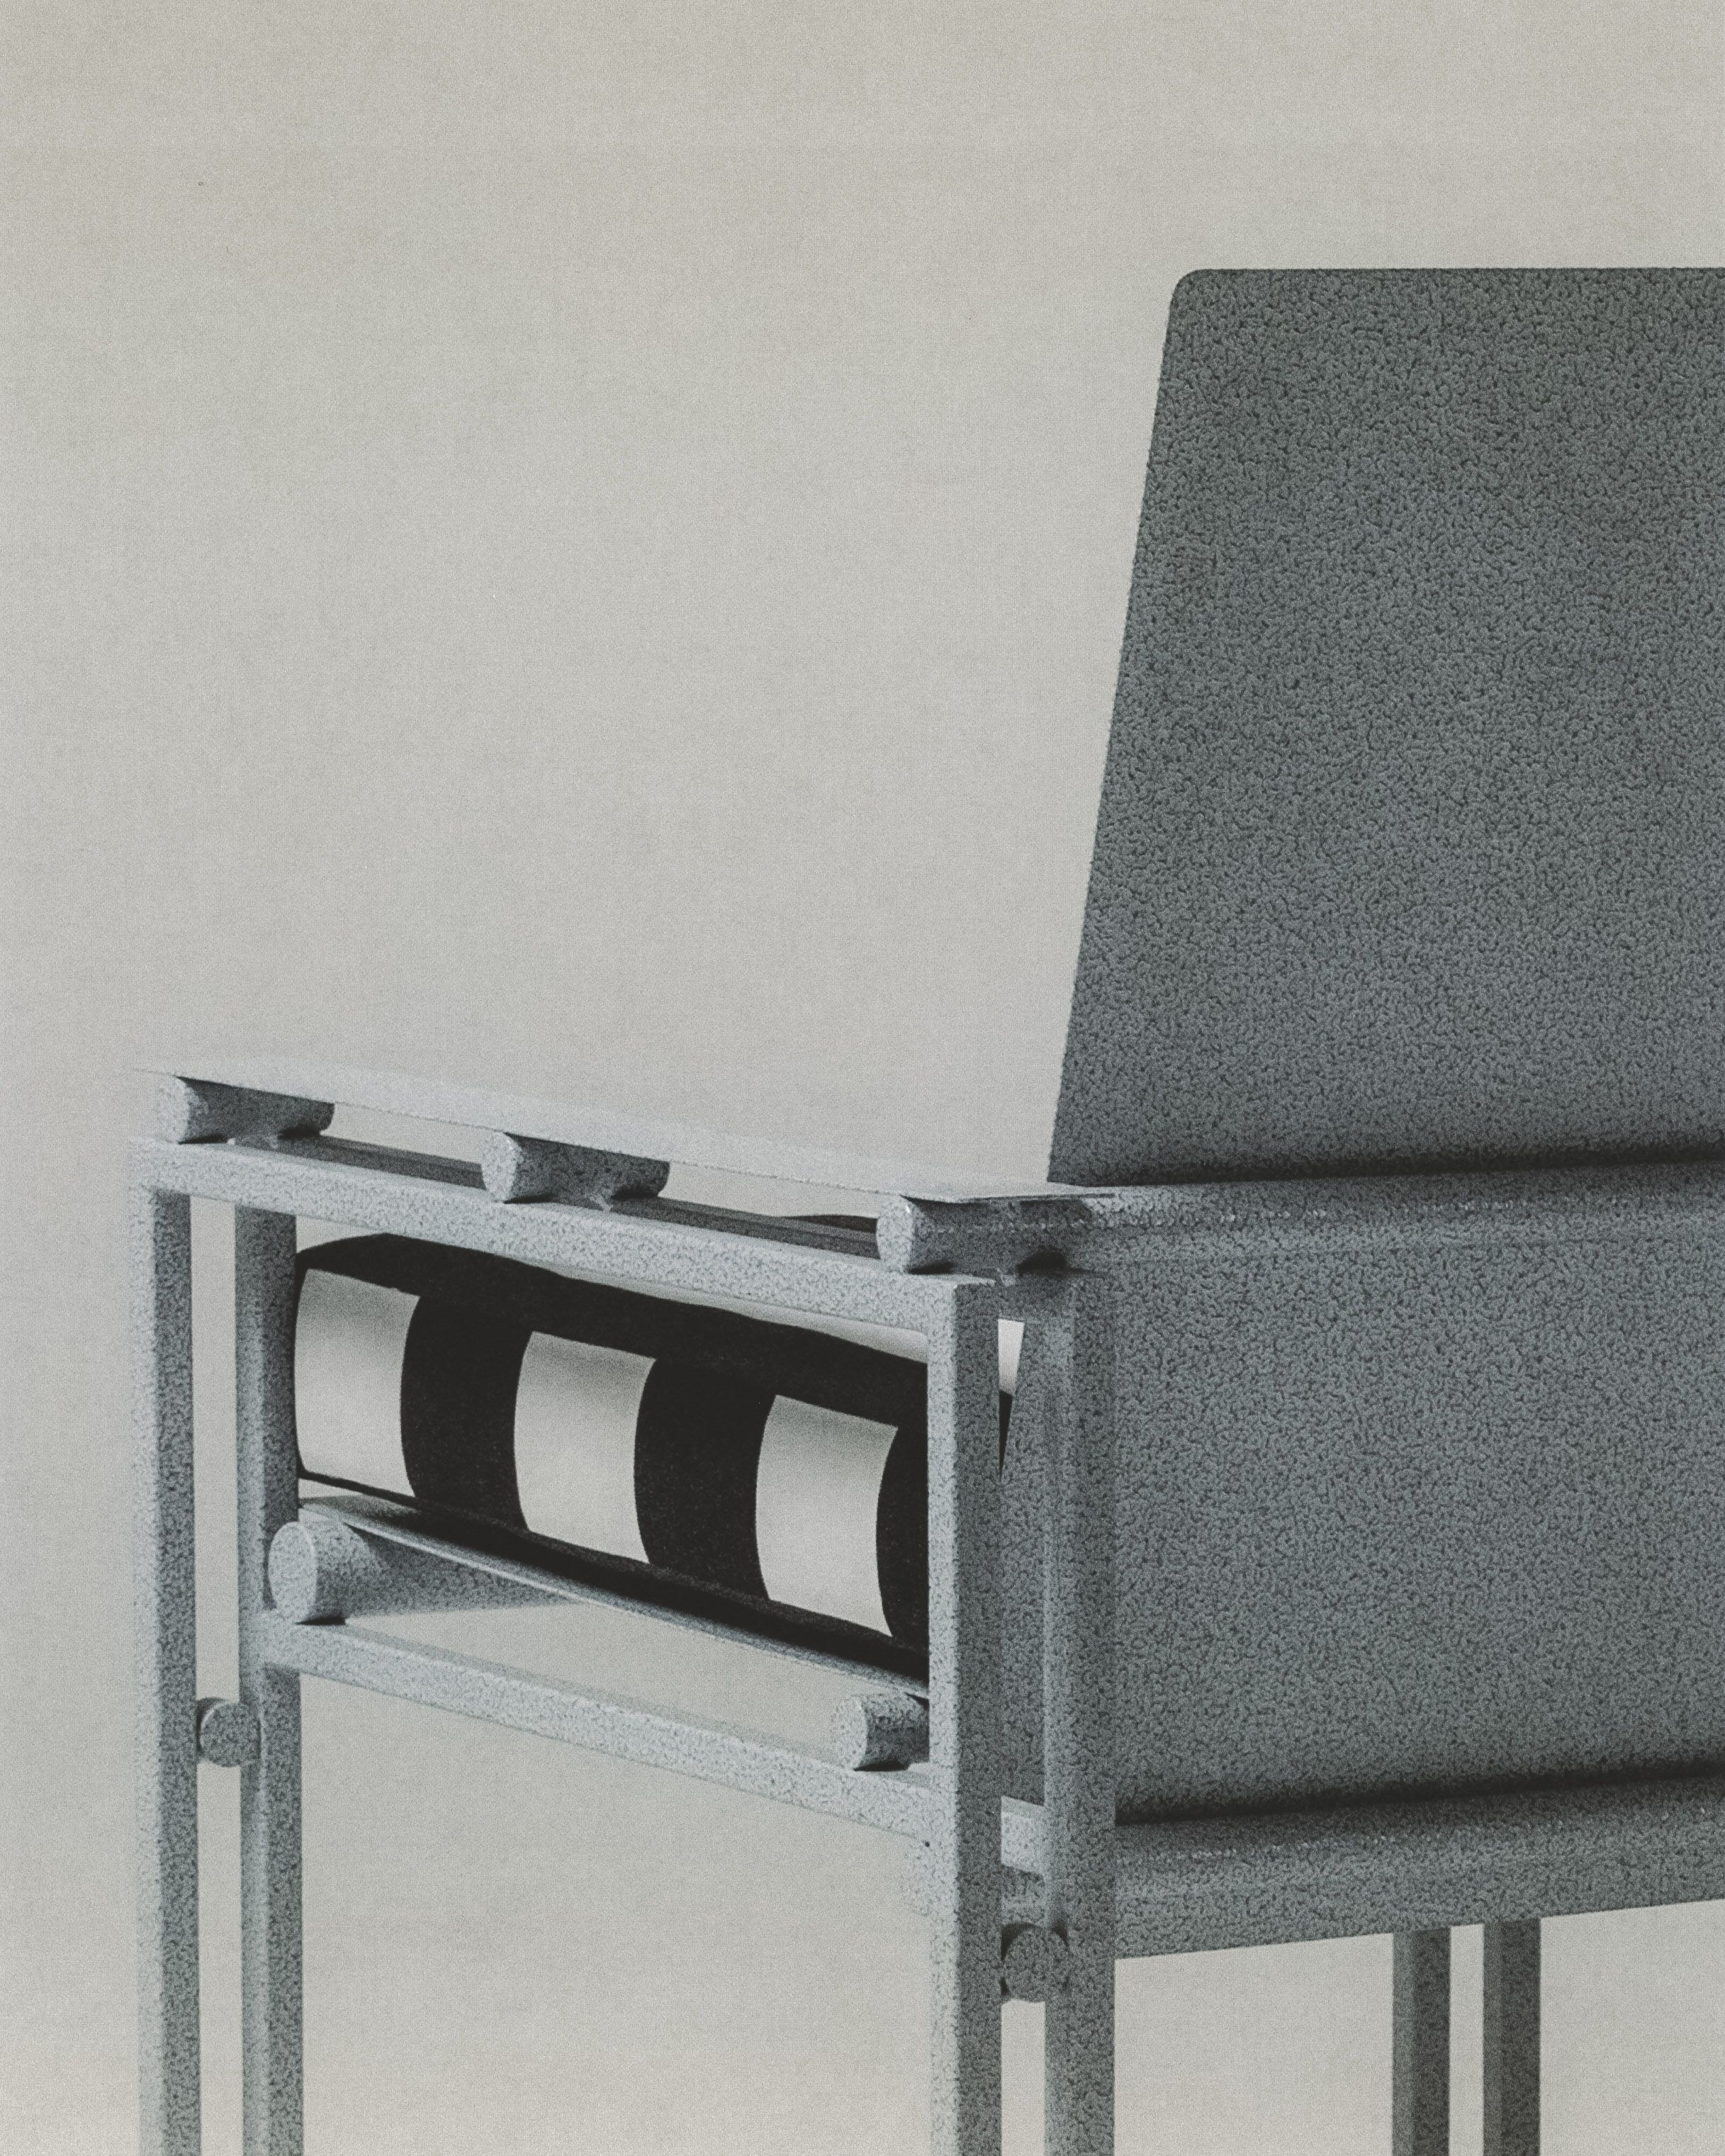 Suspension Metal Lounge product image 1